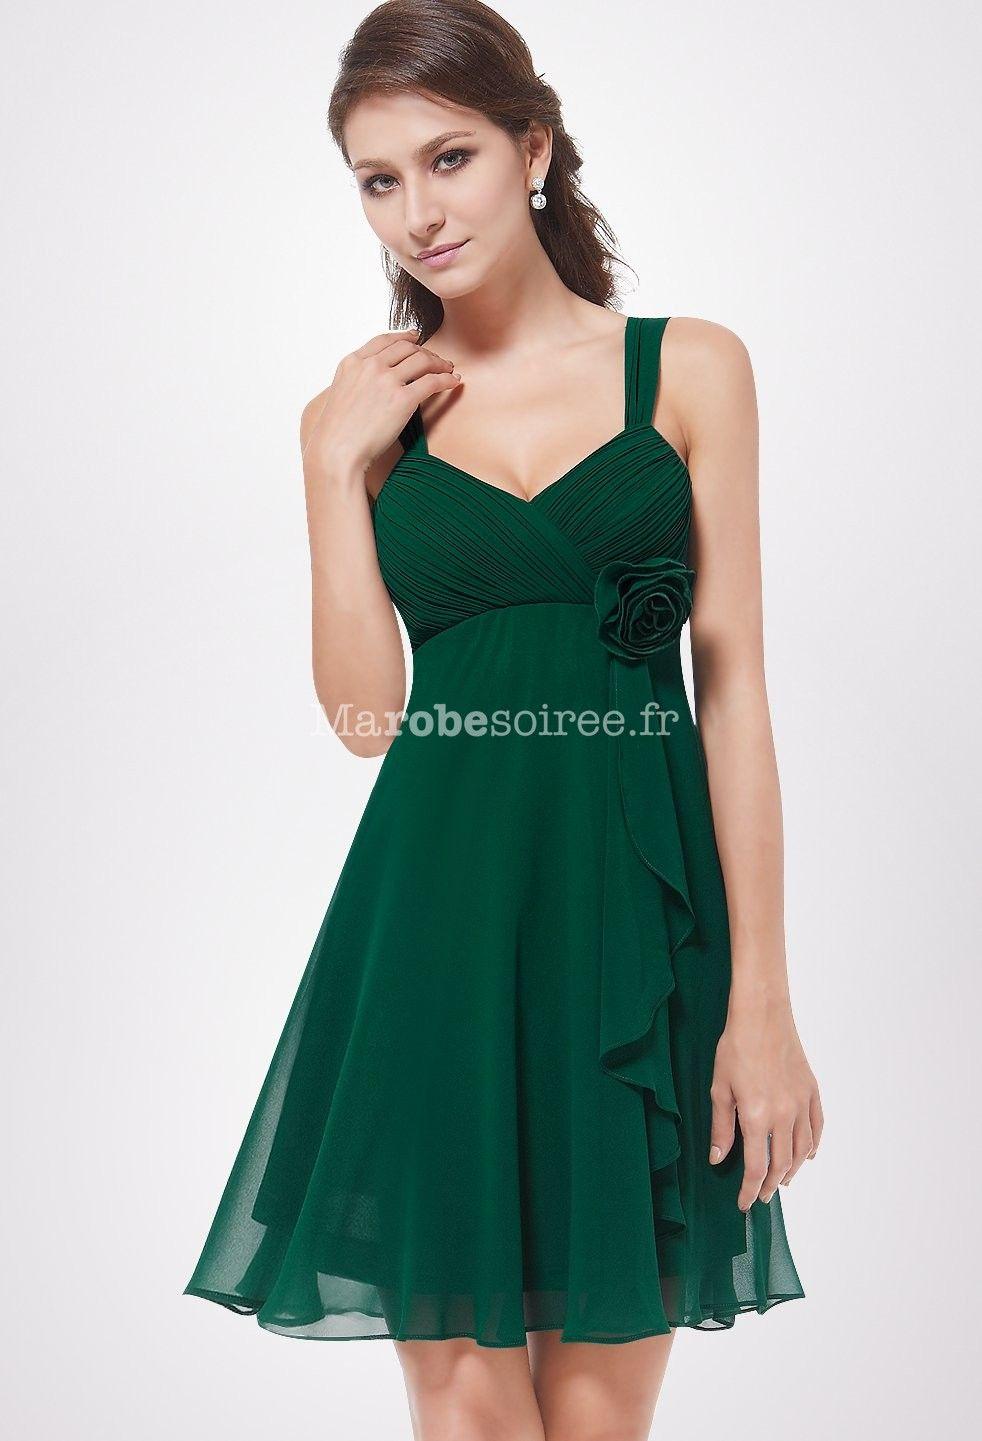 d7b5ac12387 Loren - robe de soiree courte réf 3266